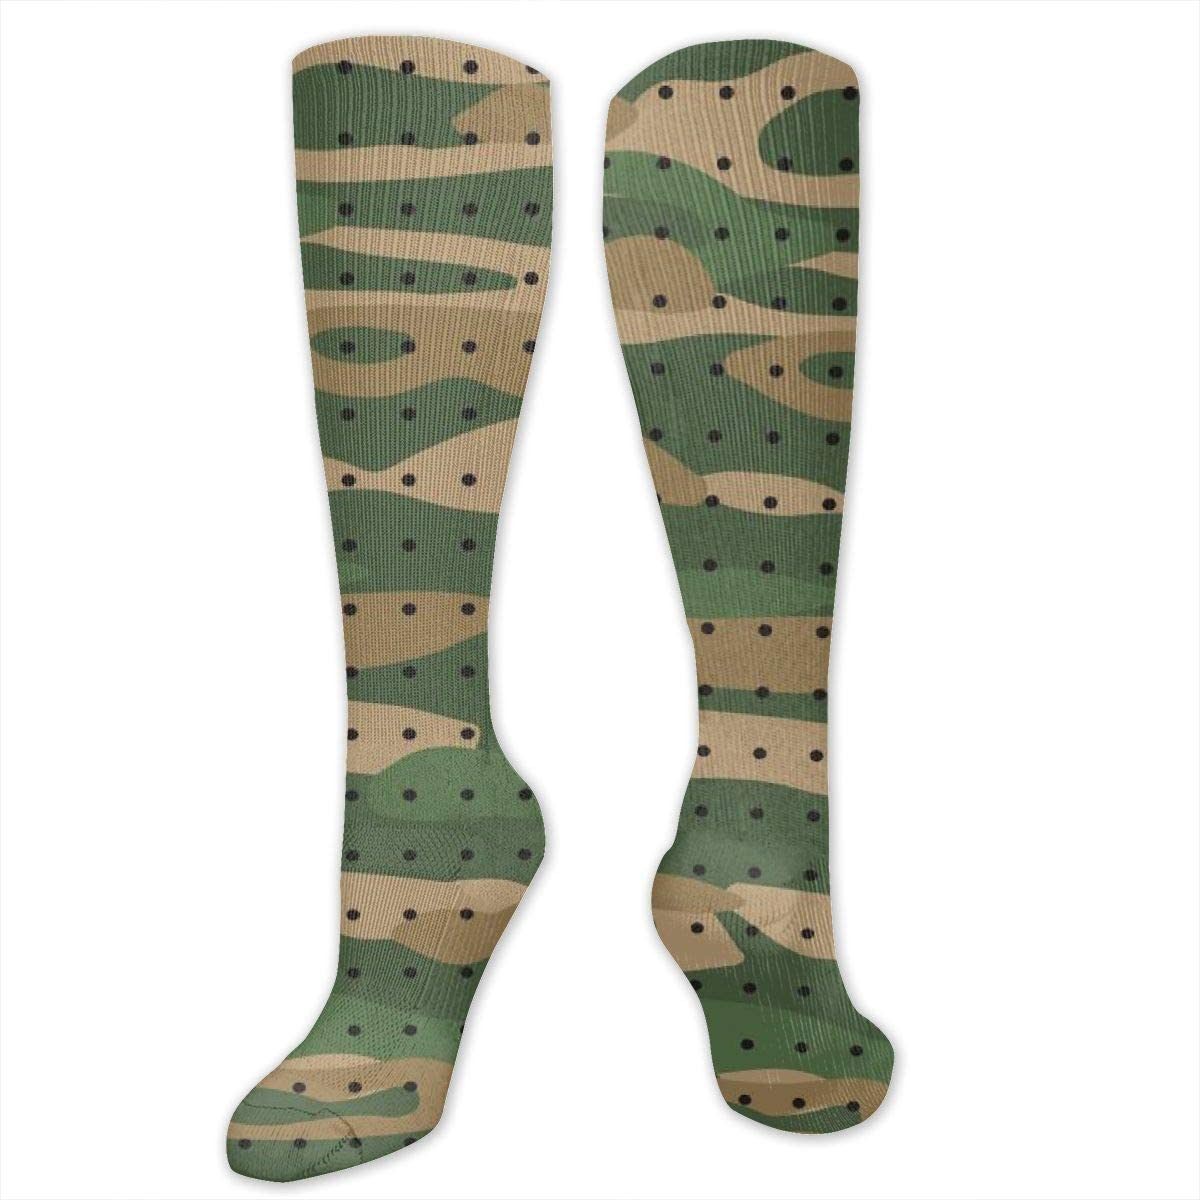 Knee High Socks For Men Women Green Camo Print Cycling Hose Stockings